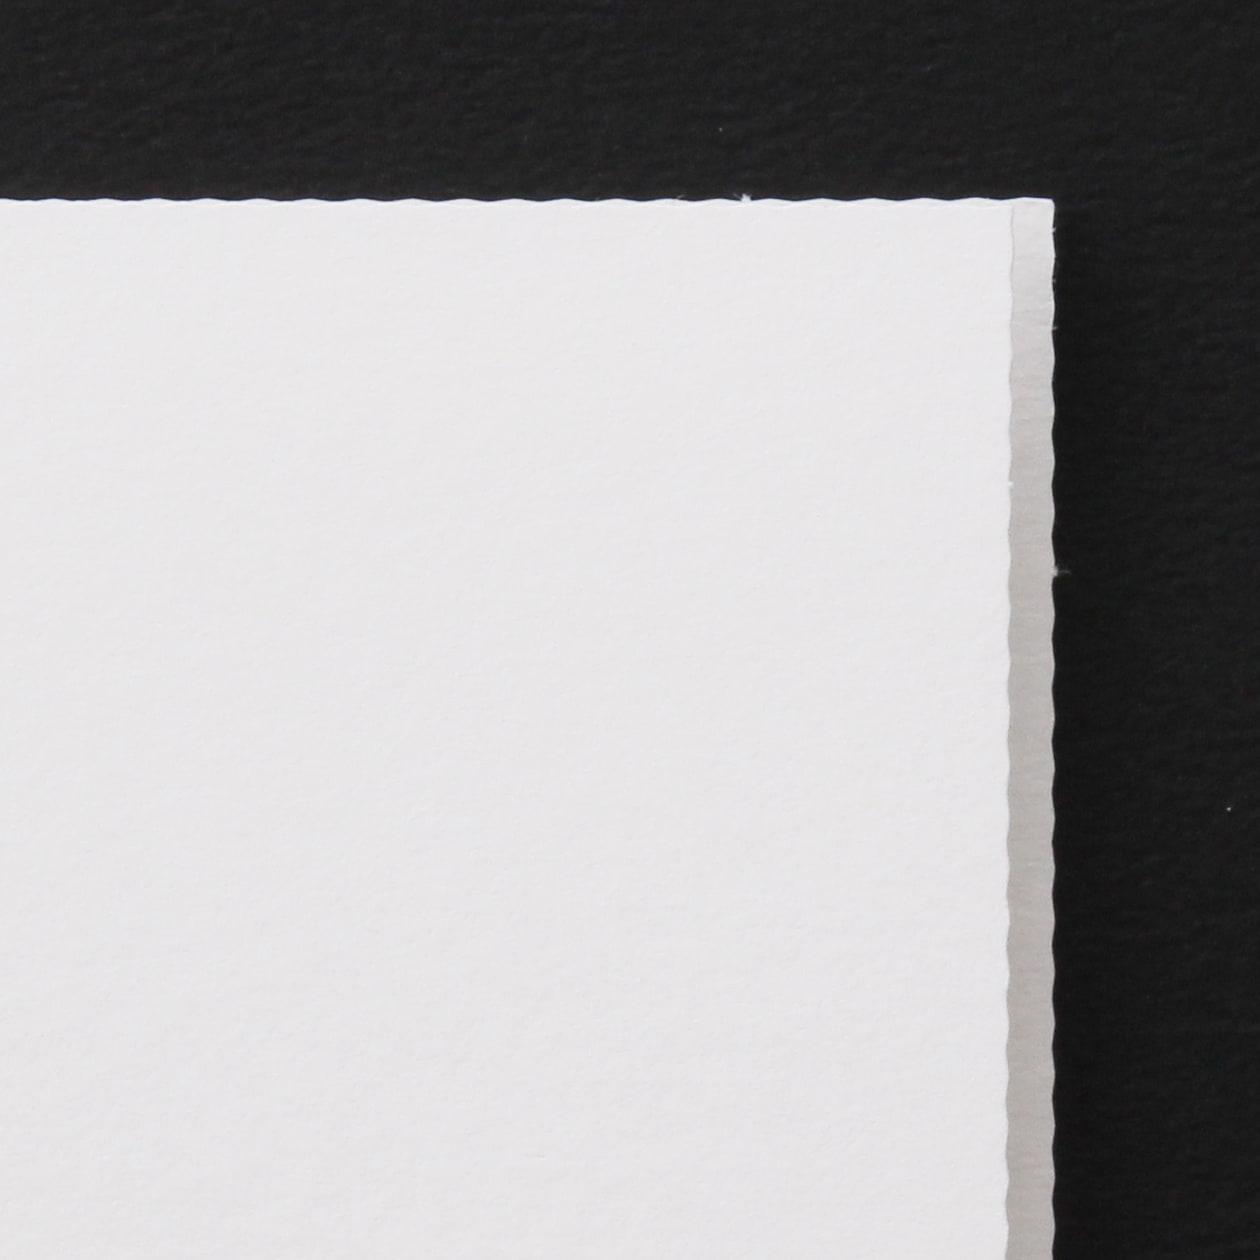 A4ファイル HAGURUMA Basic プレインホワイト 150g